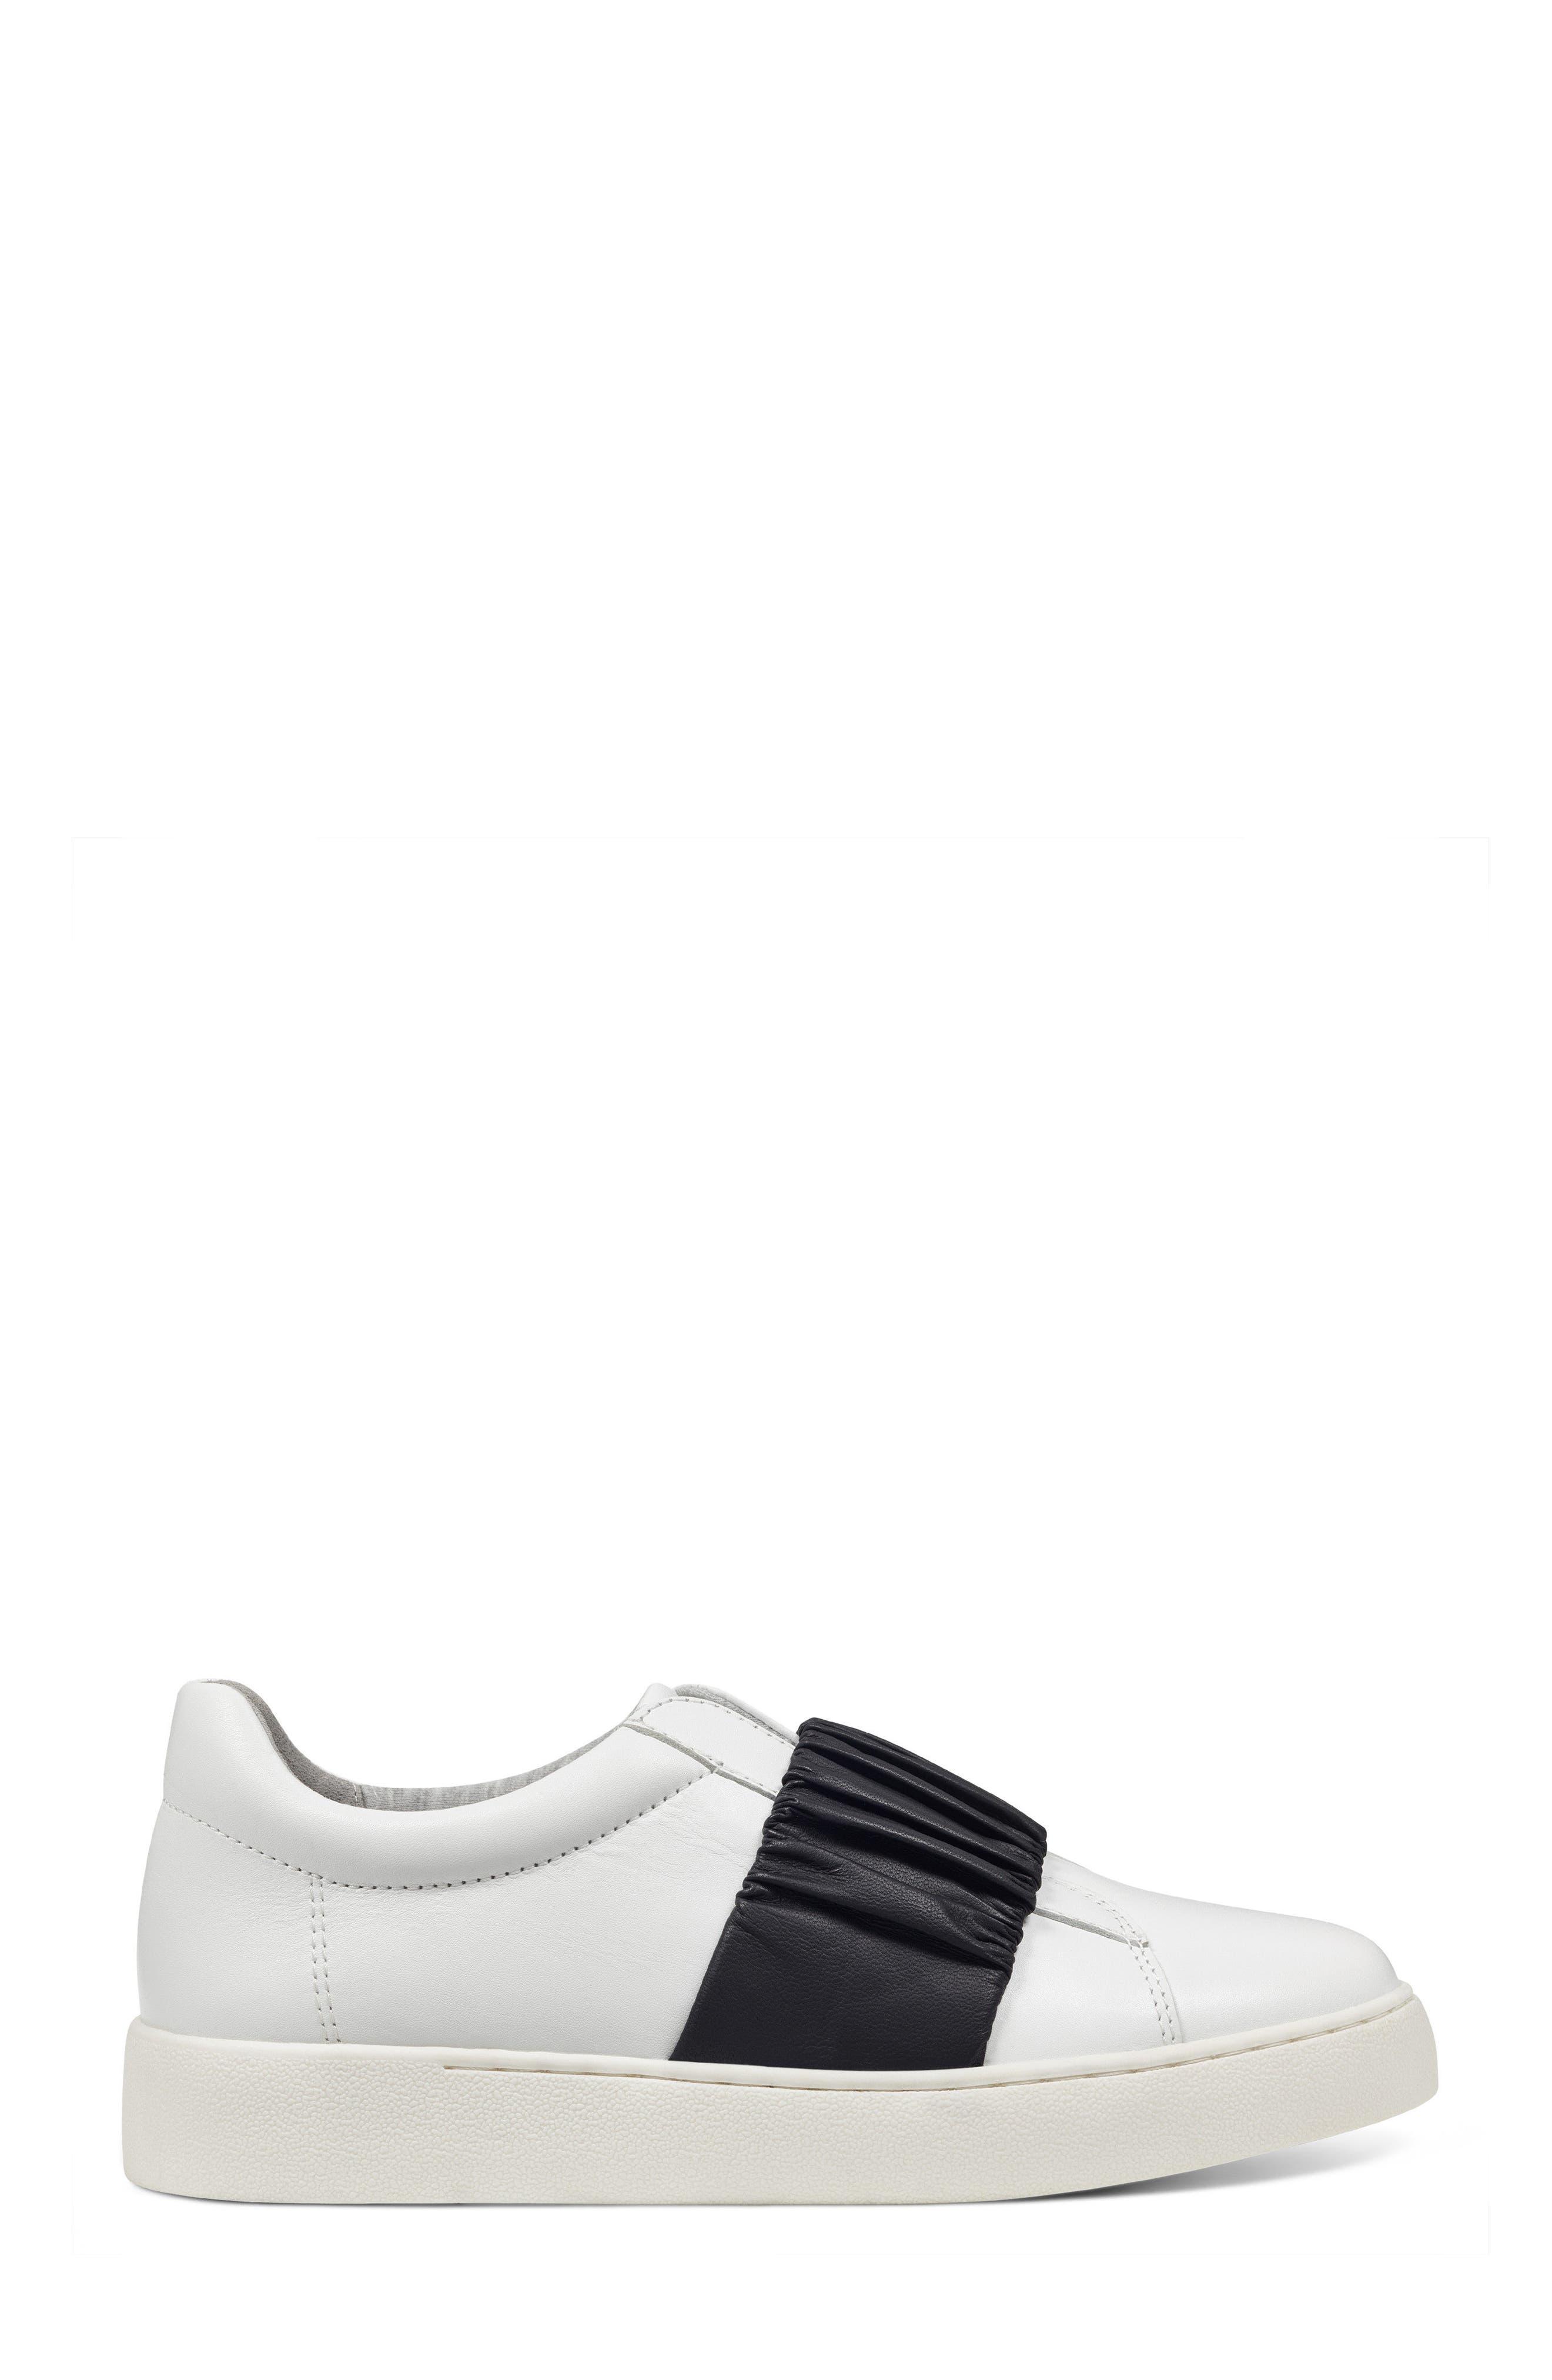 Pindiviah Slip-On Sneaker,                             Alternate thumbnail 3, color,                             White/ Black Leather